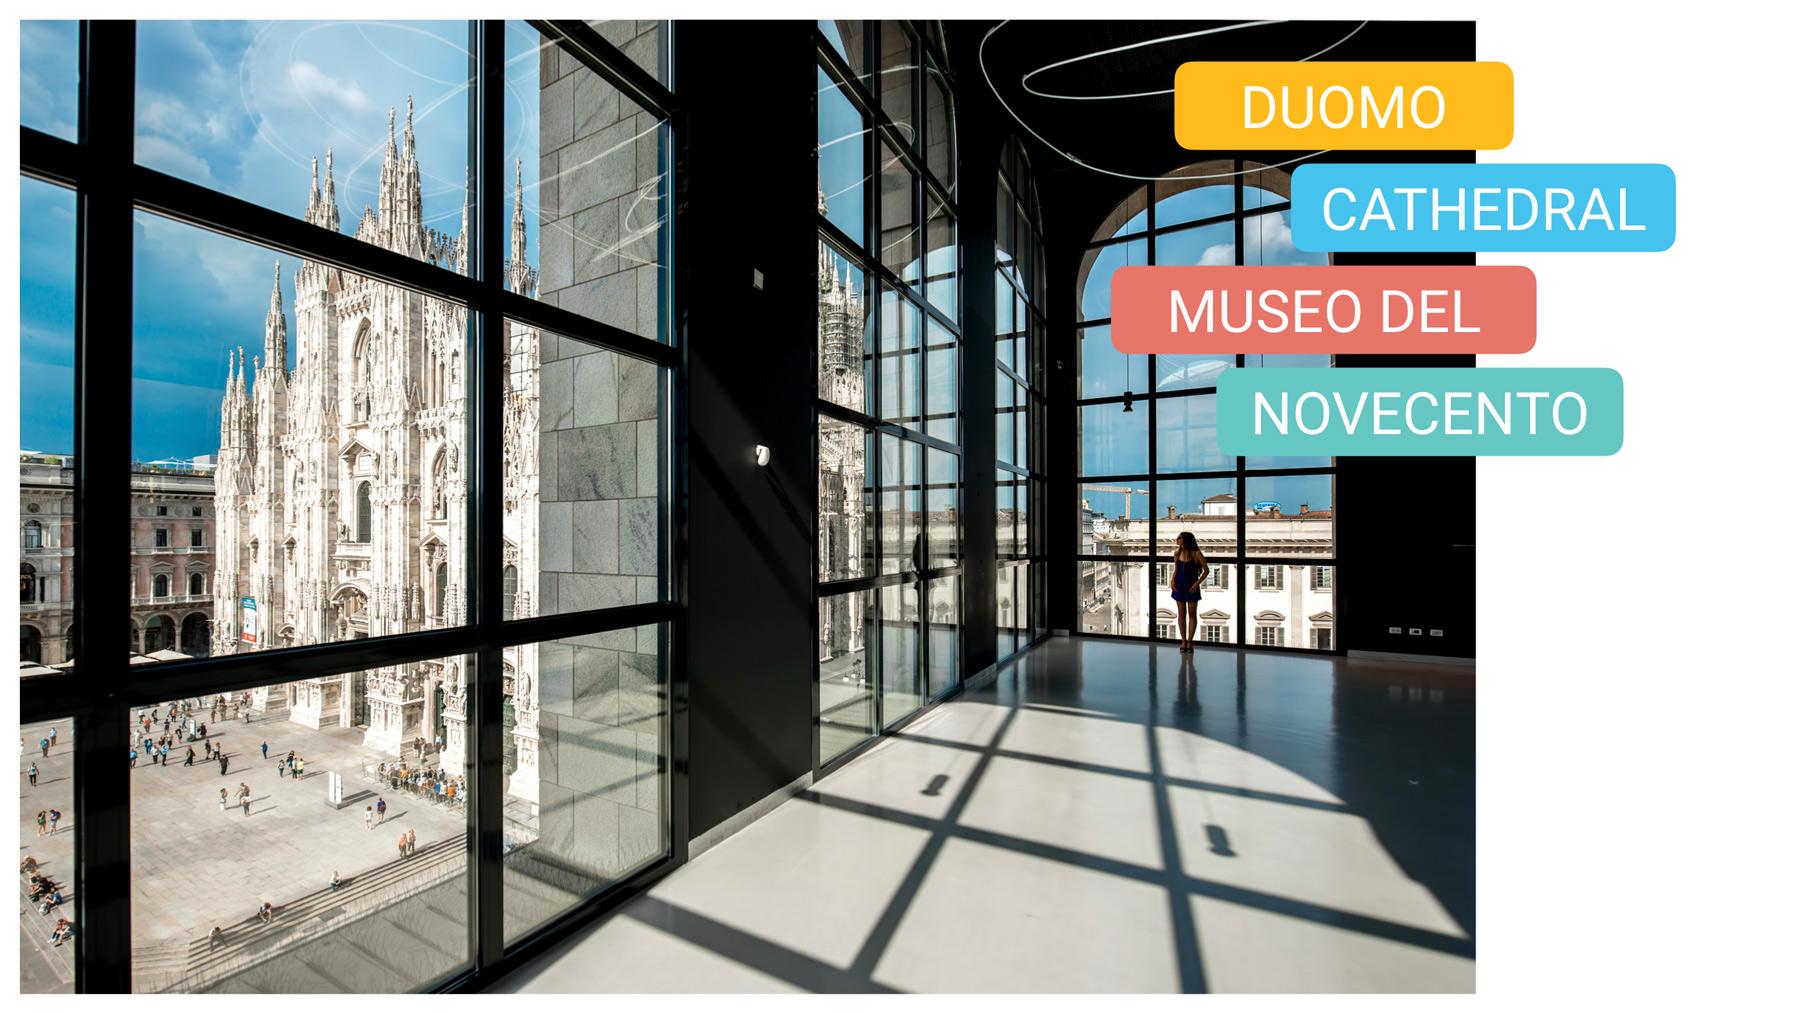 visit-milan-cathedral-duomo-city-center-xxth-museum-arengario